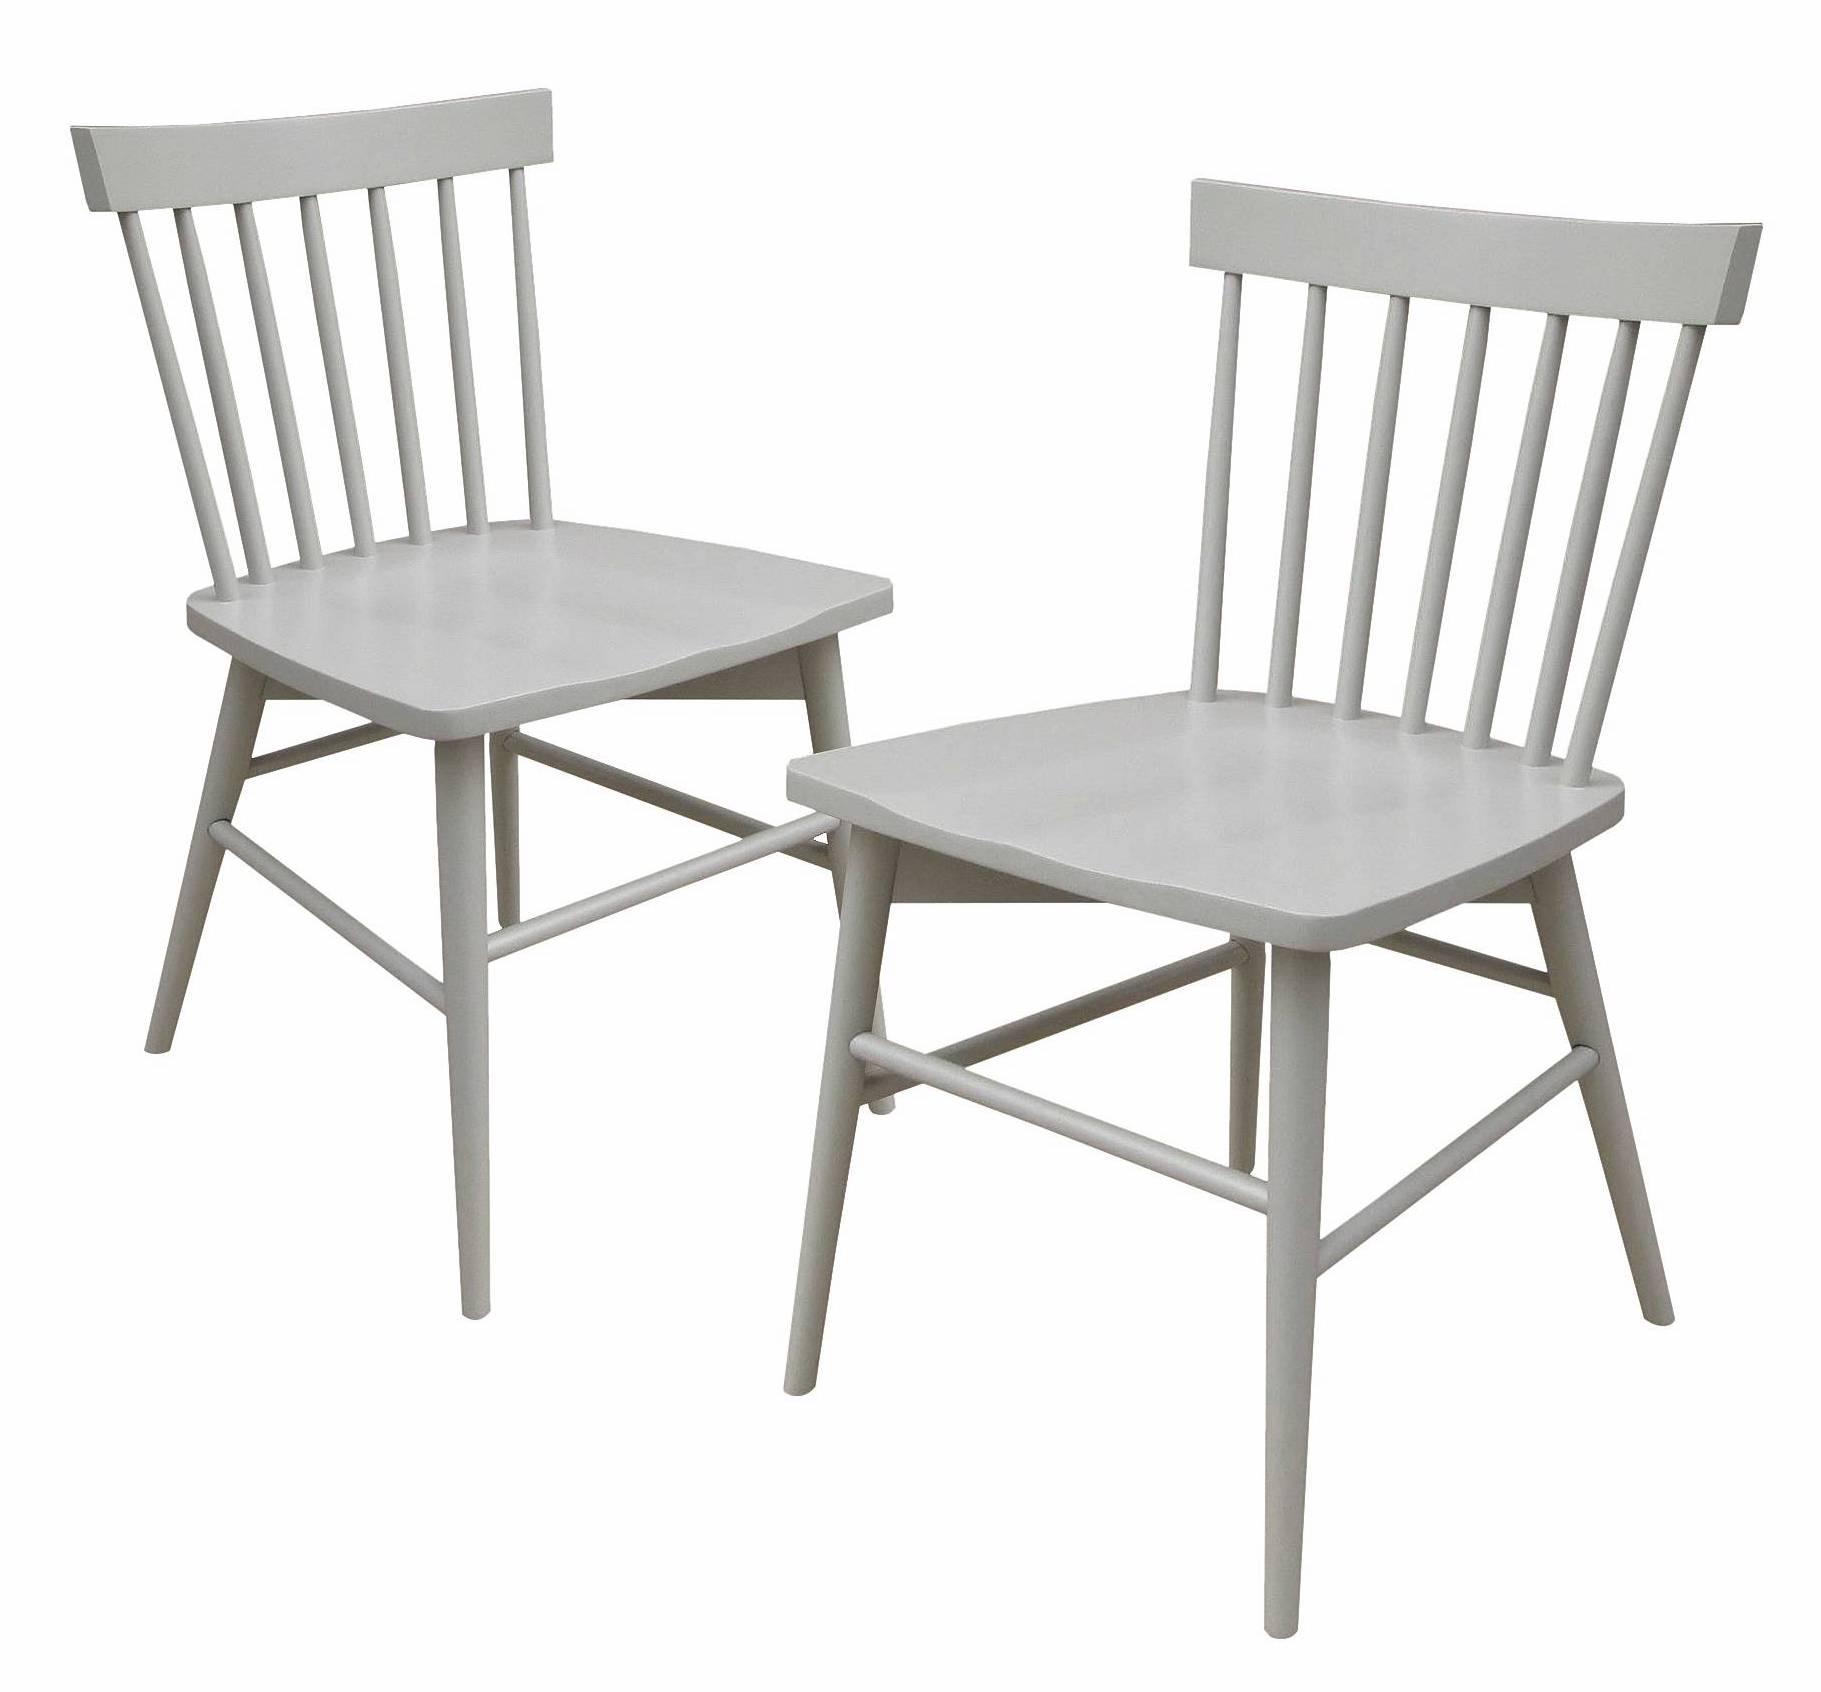 Target windsor dining chair set of 2.jpeg